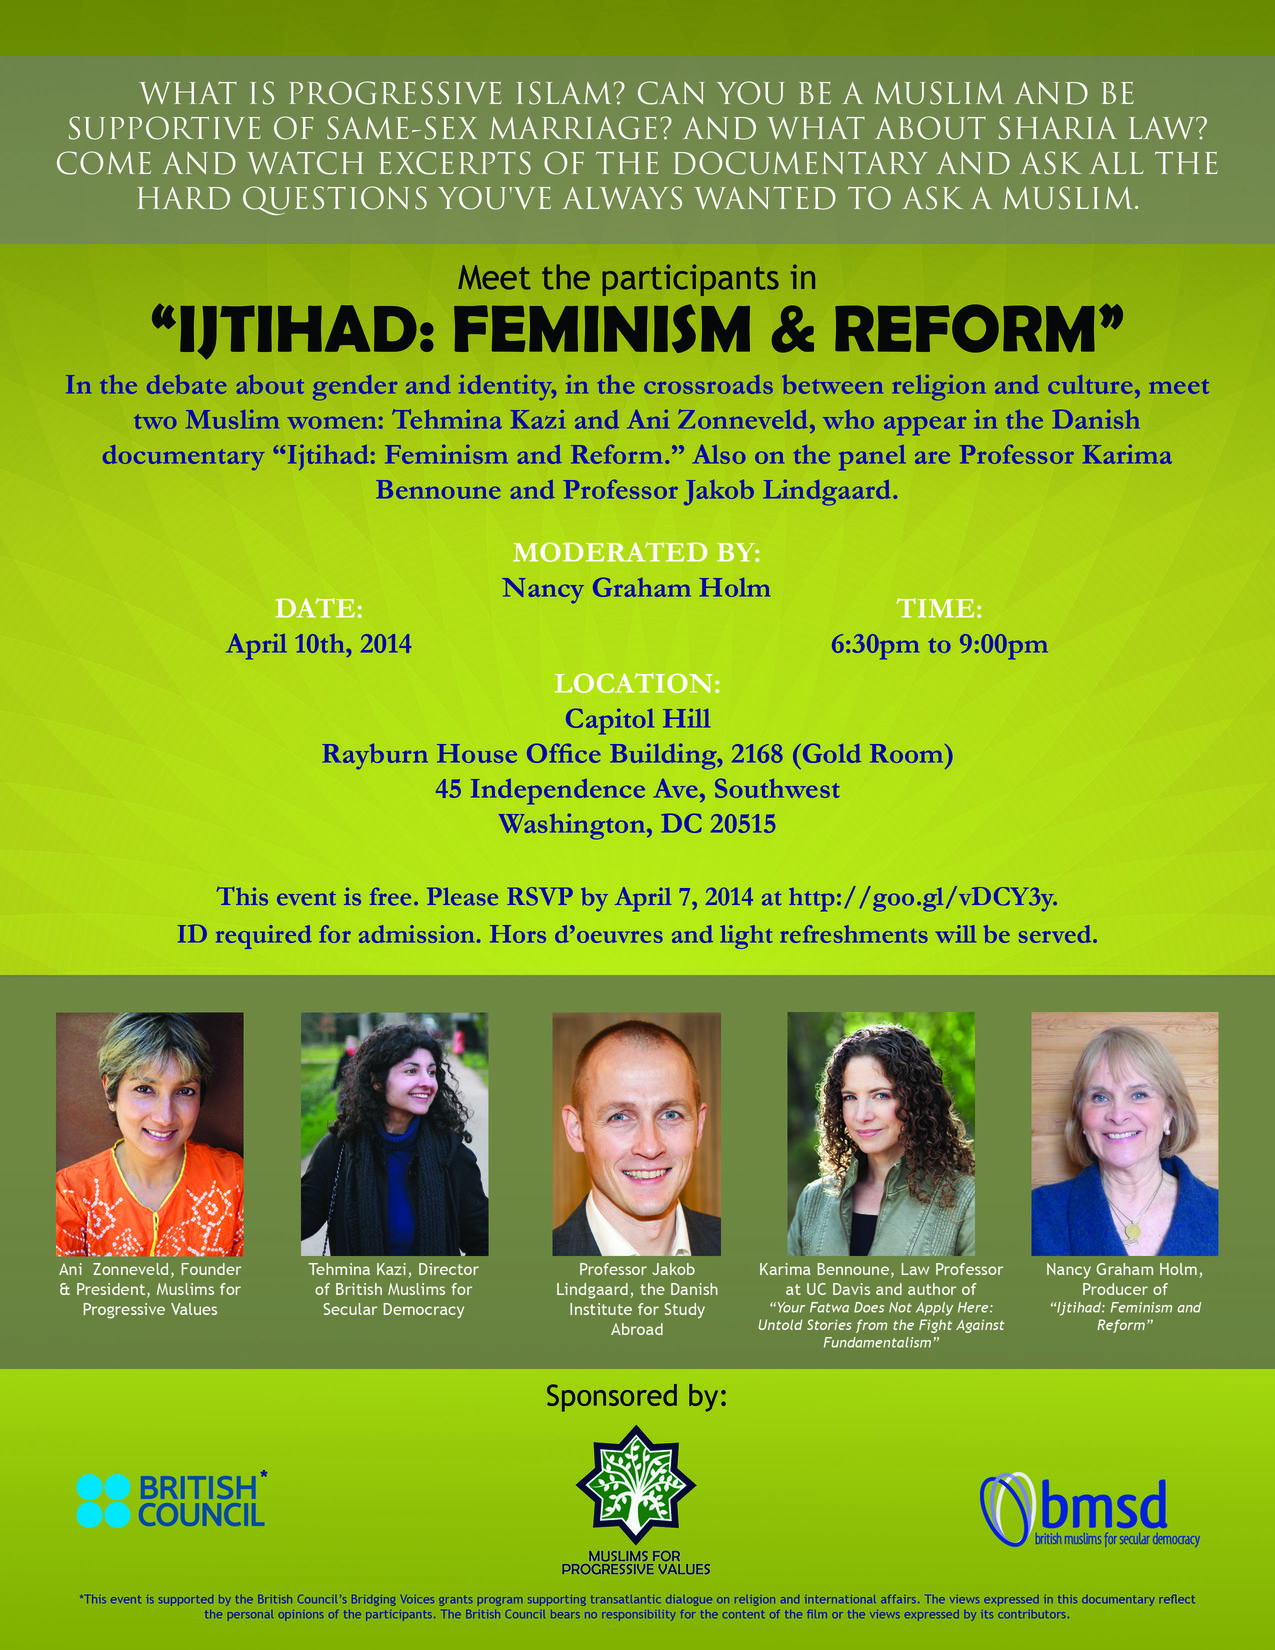 Ijtihad: Feminism and Reform